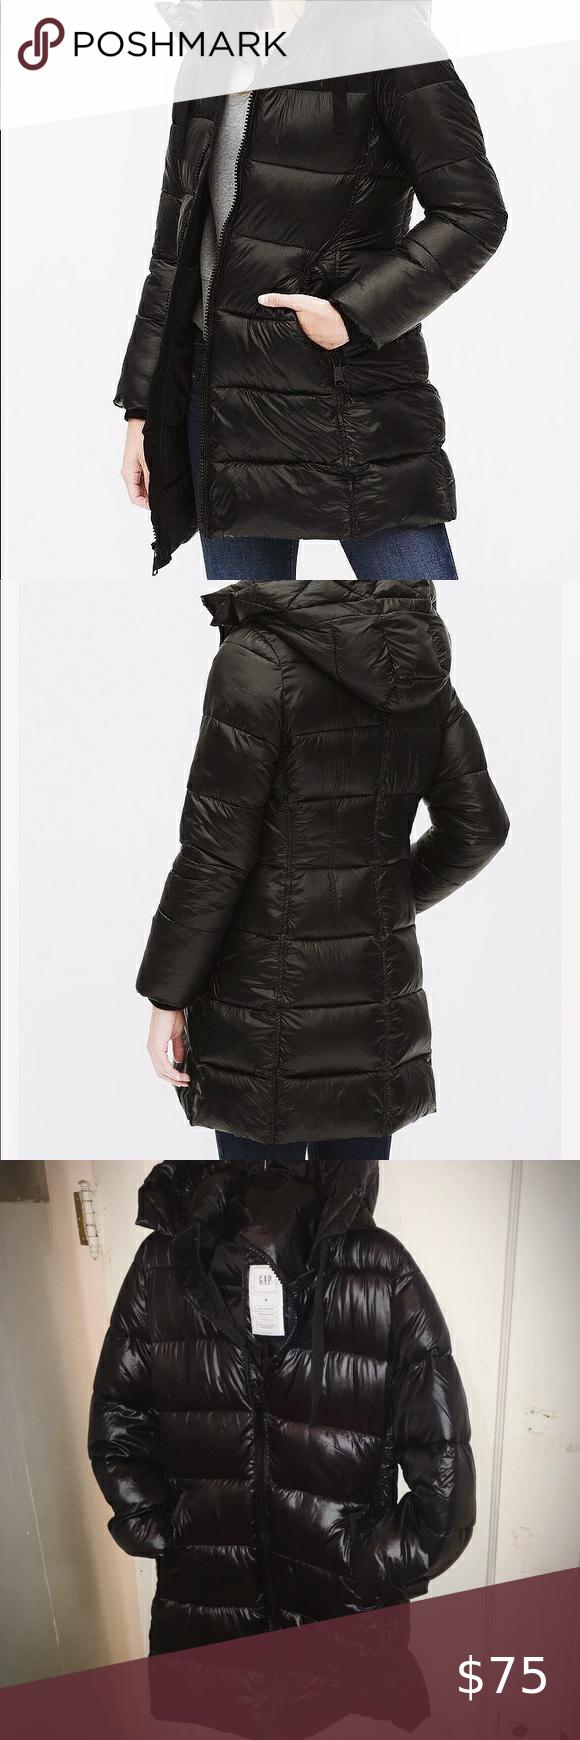 New Gap Coldcontrol Puffer Coat Size M Clothes Design Puffer Coat Fashion [ 1740 x 580 Pixel ]